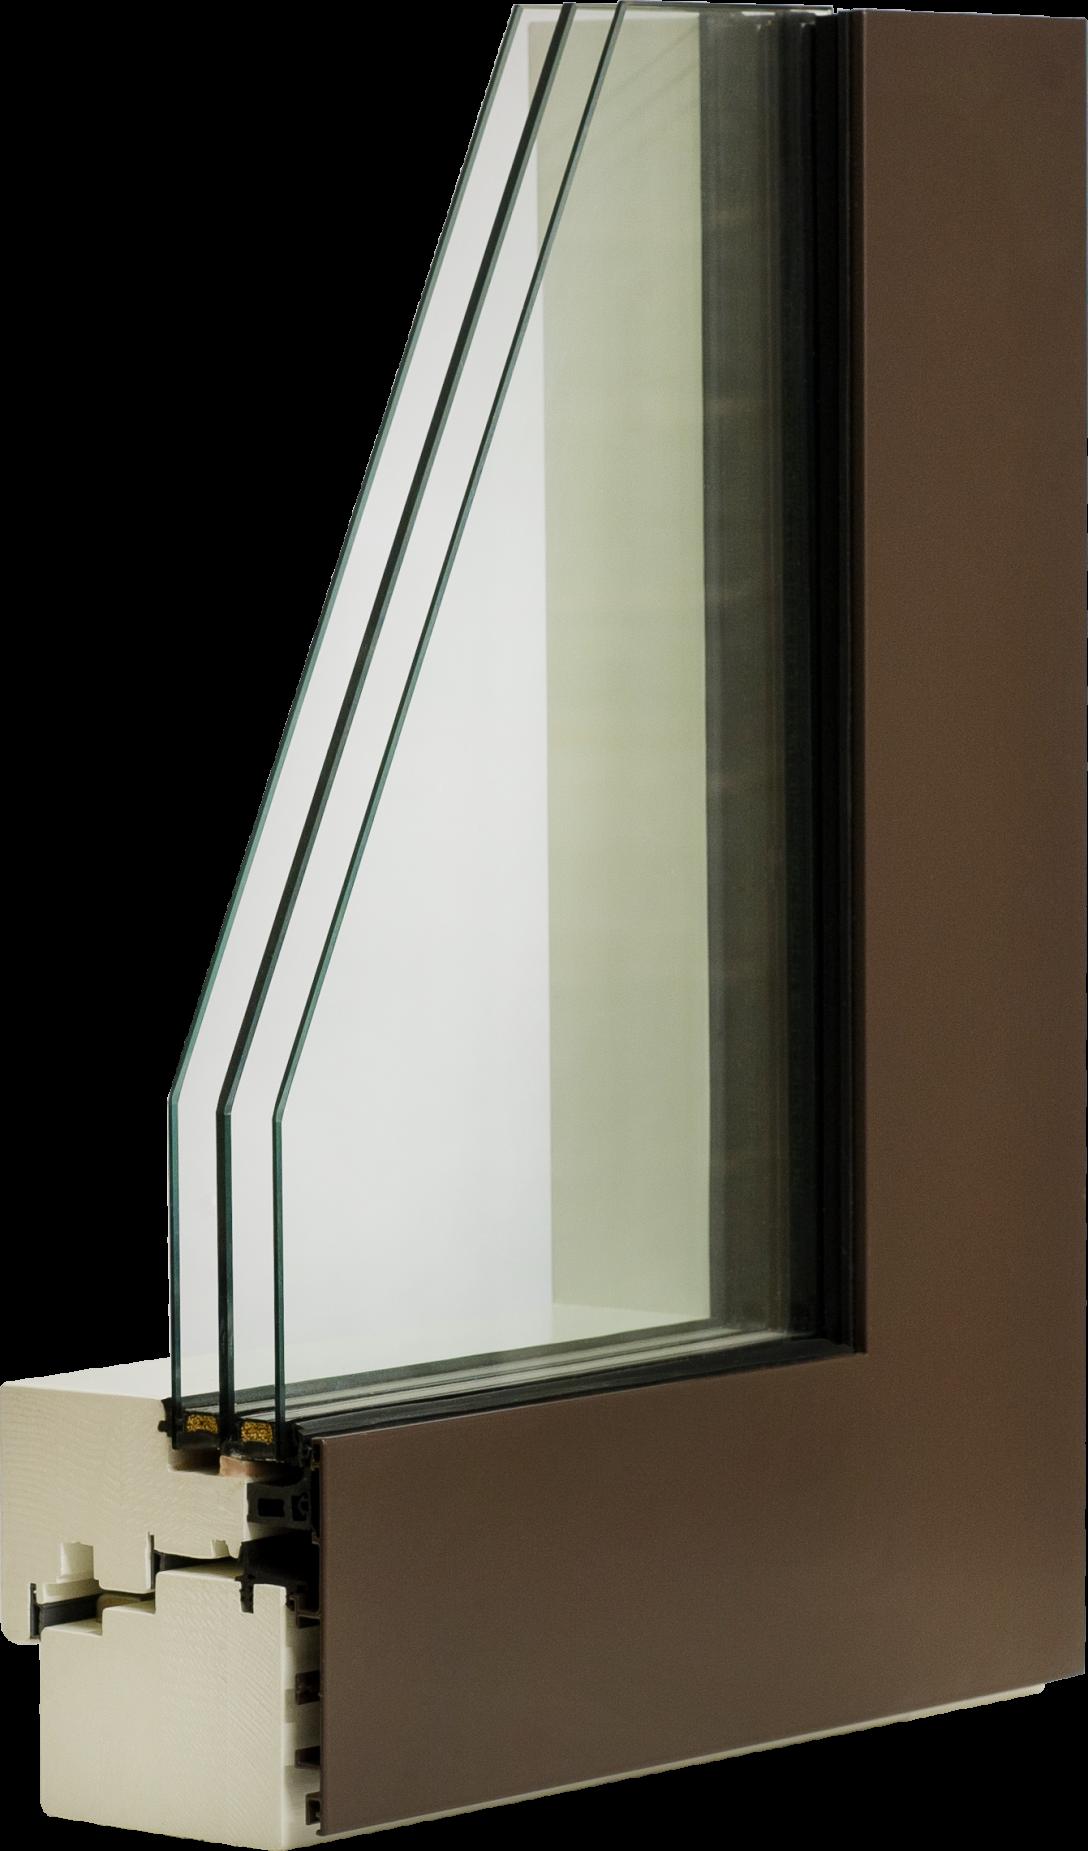 Large Size of Fenster Preise Holz Alu Kunststoff Kosten Erfahrungen Unilux Pro Qm Kostenvergleich Holz Alu Preisliste Holz Aluminium Hersteller Holz Alu Fenster Mit 3 Fach Fenster Fenster Holz Alu